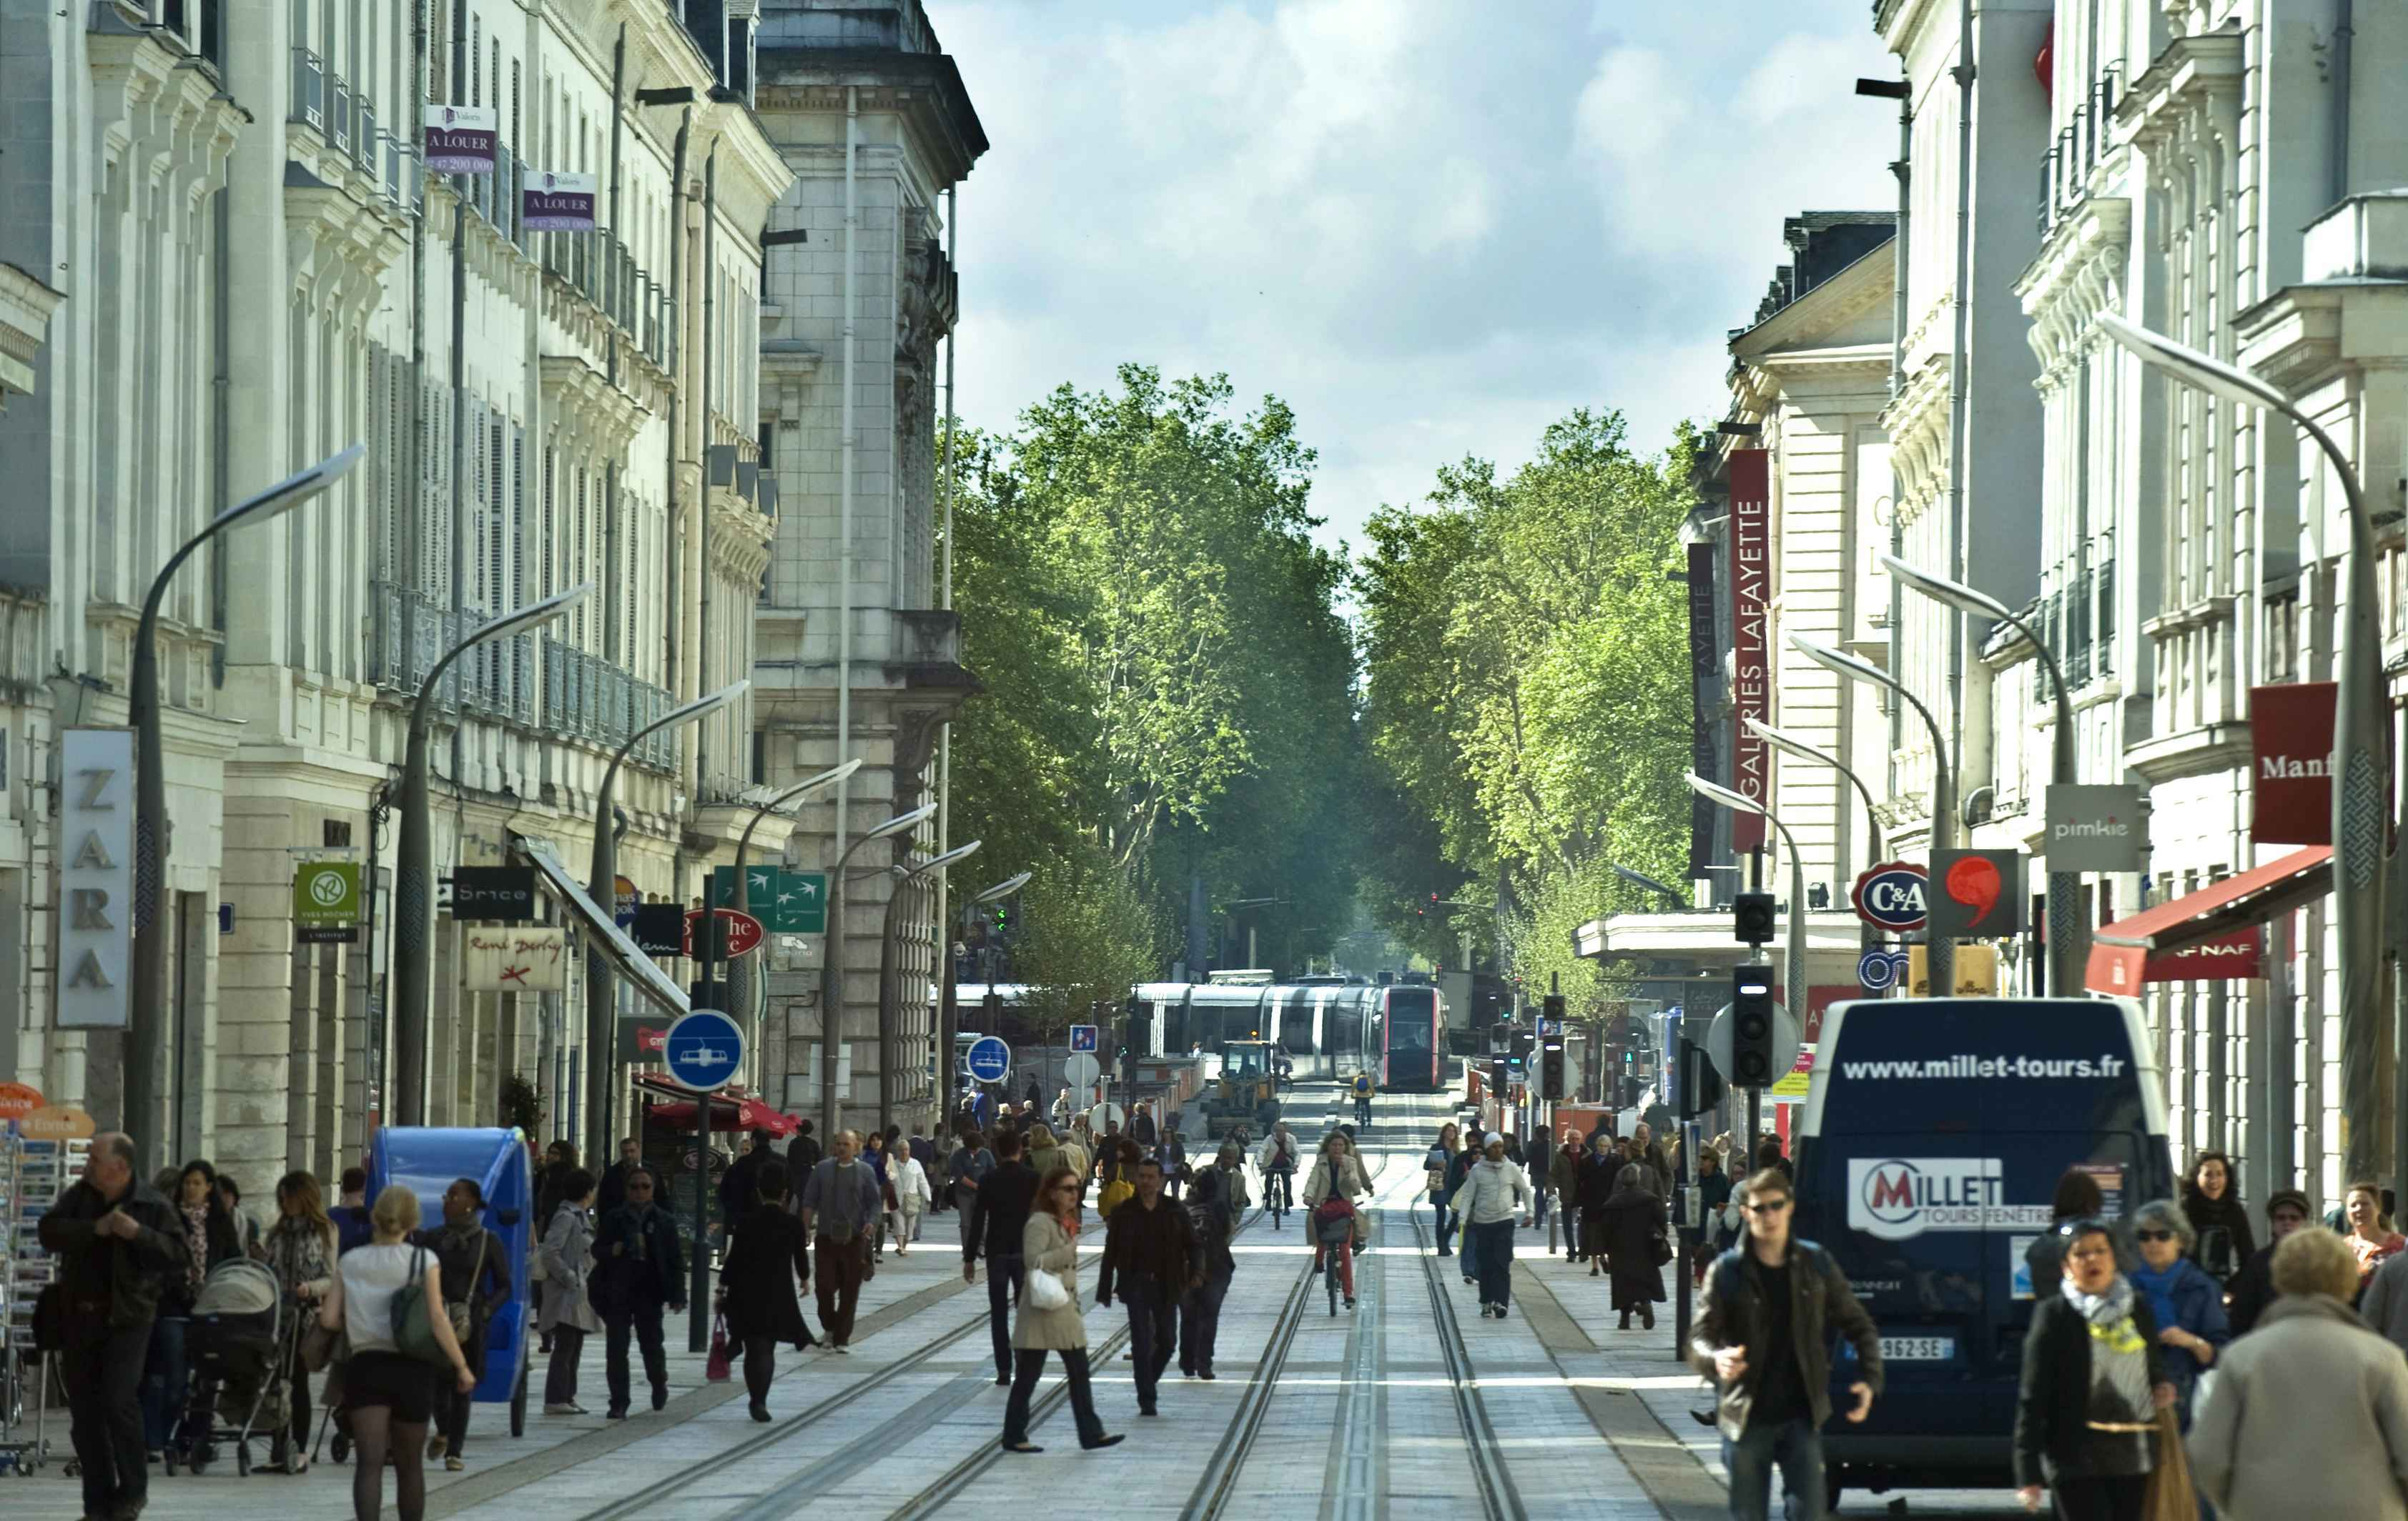 TOURS_rue_nationale_tours